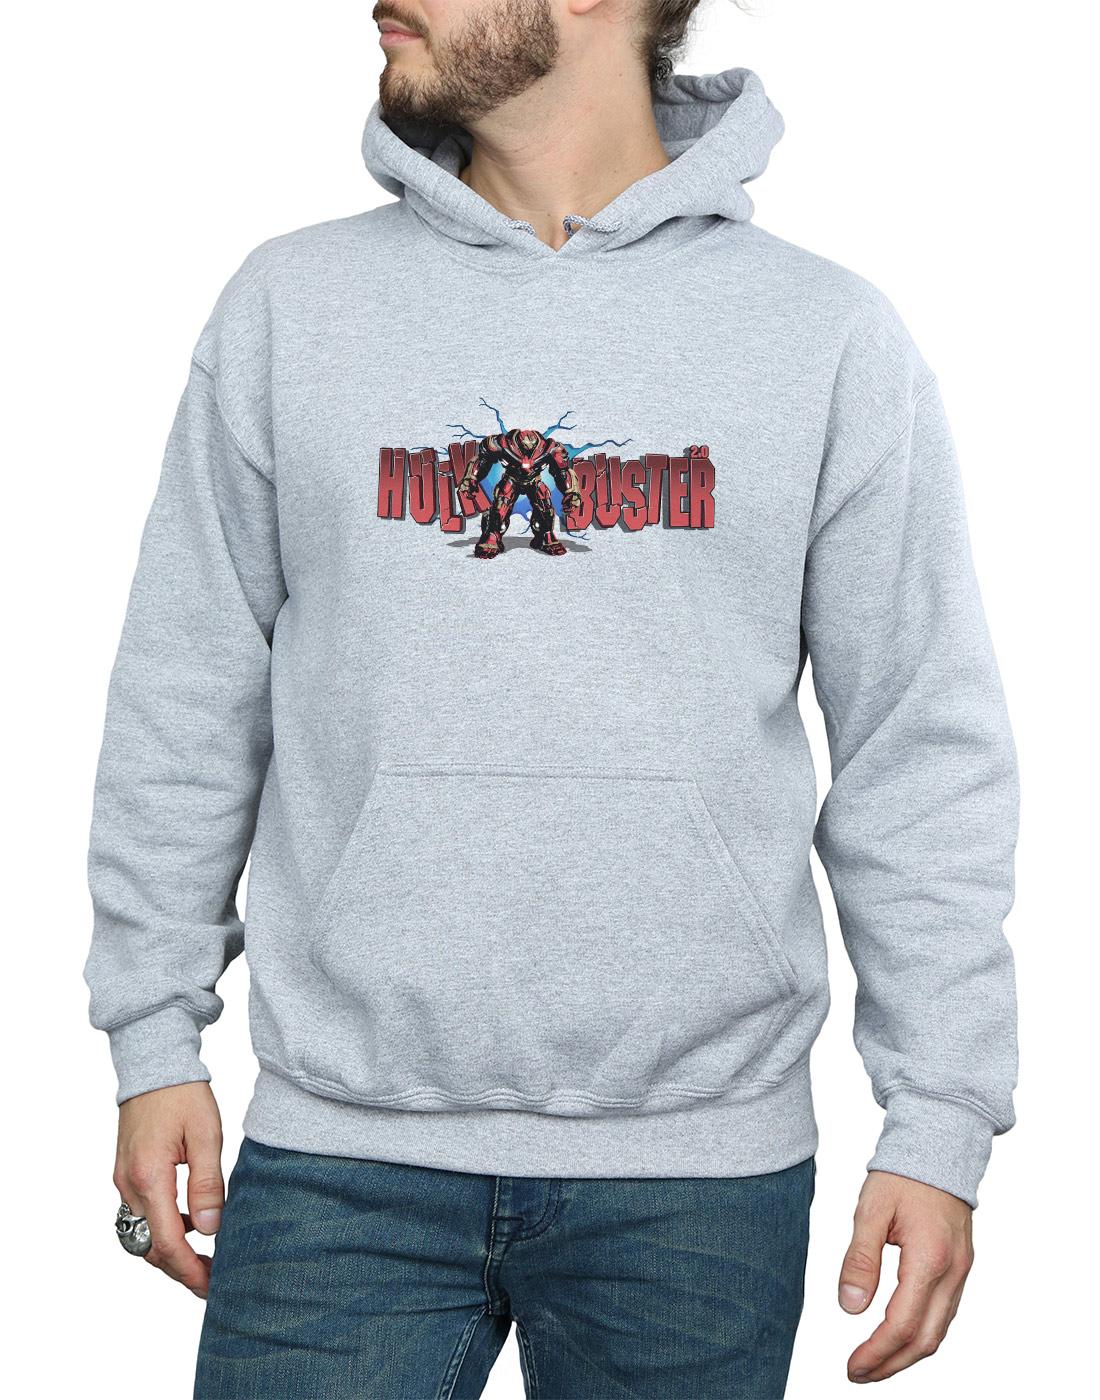 Avengers Uomo Uomo Uomo Infinity War Hulkbuster 2.0 Felpa Con Cappuccio e65c02